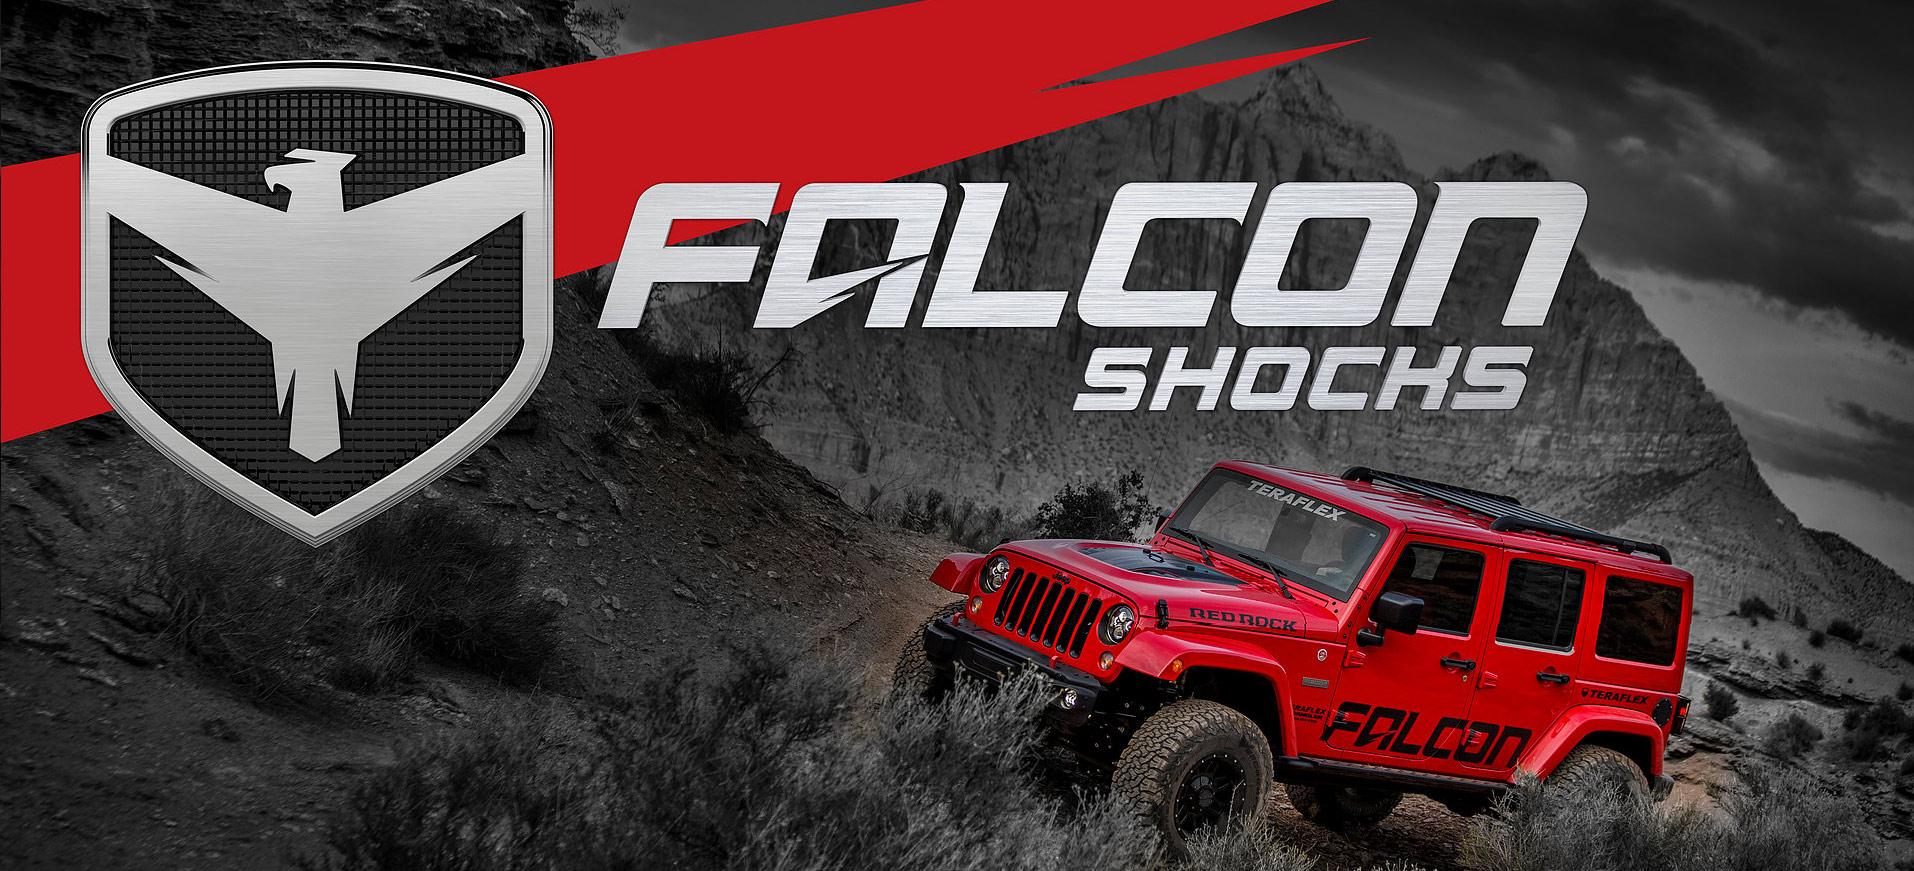 Falcon-shocks-teraflex-europe.jpg